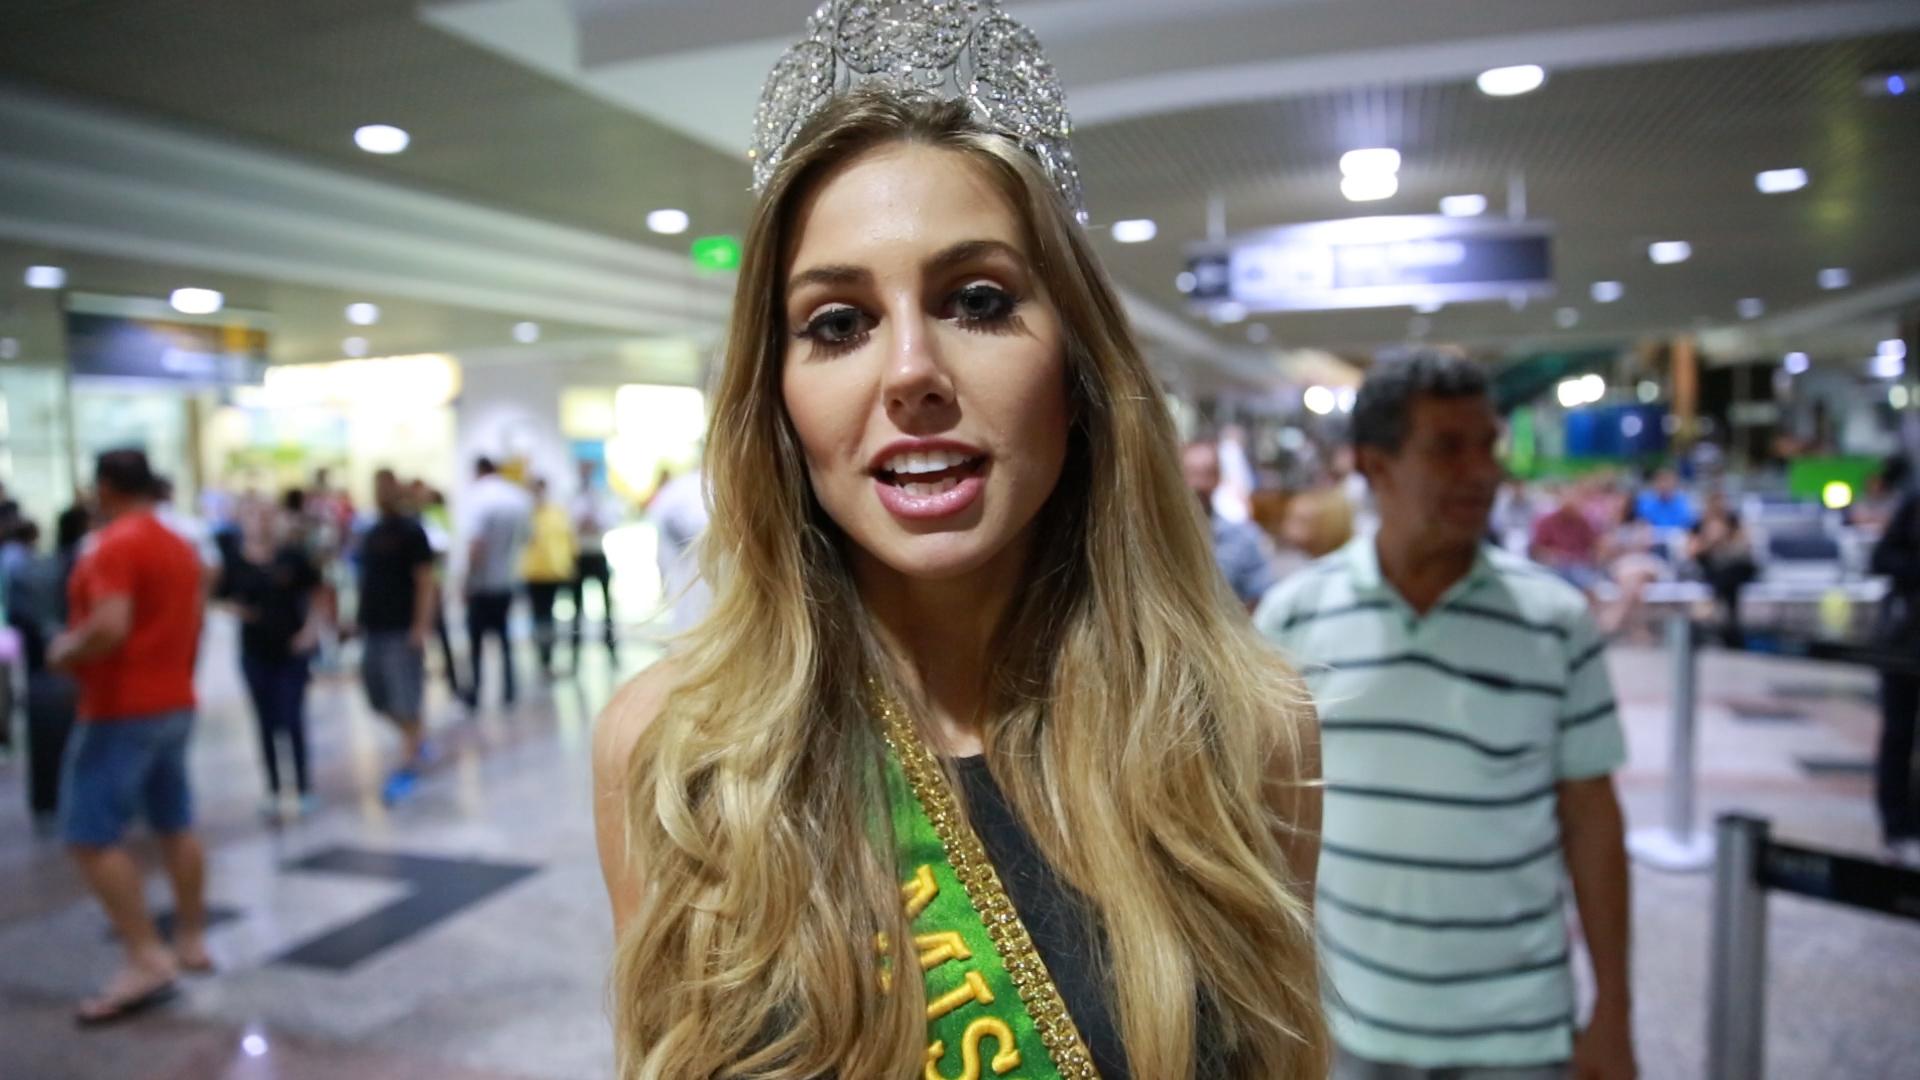 Chegada da Miss Brasil, Marthina Brandt, ao Aeroporto Salgado Filho